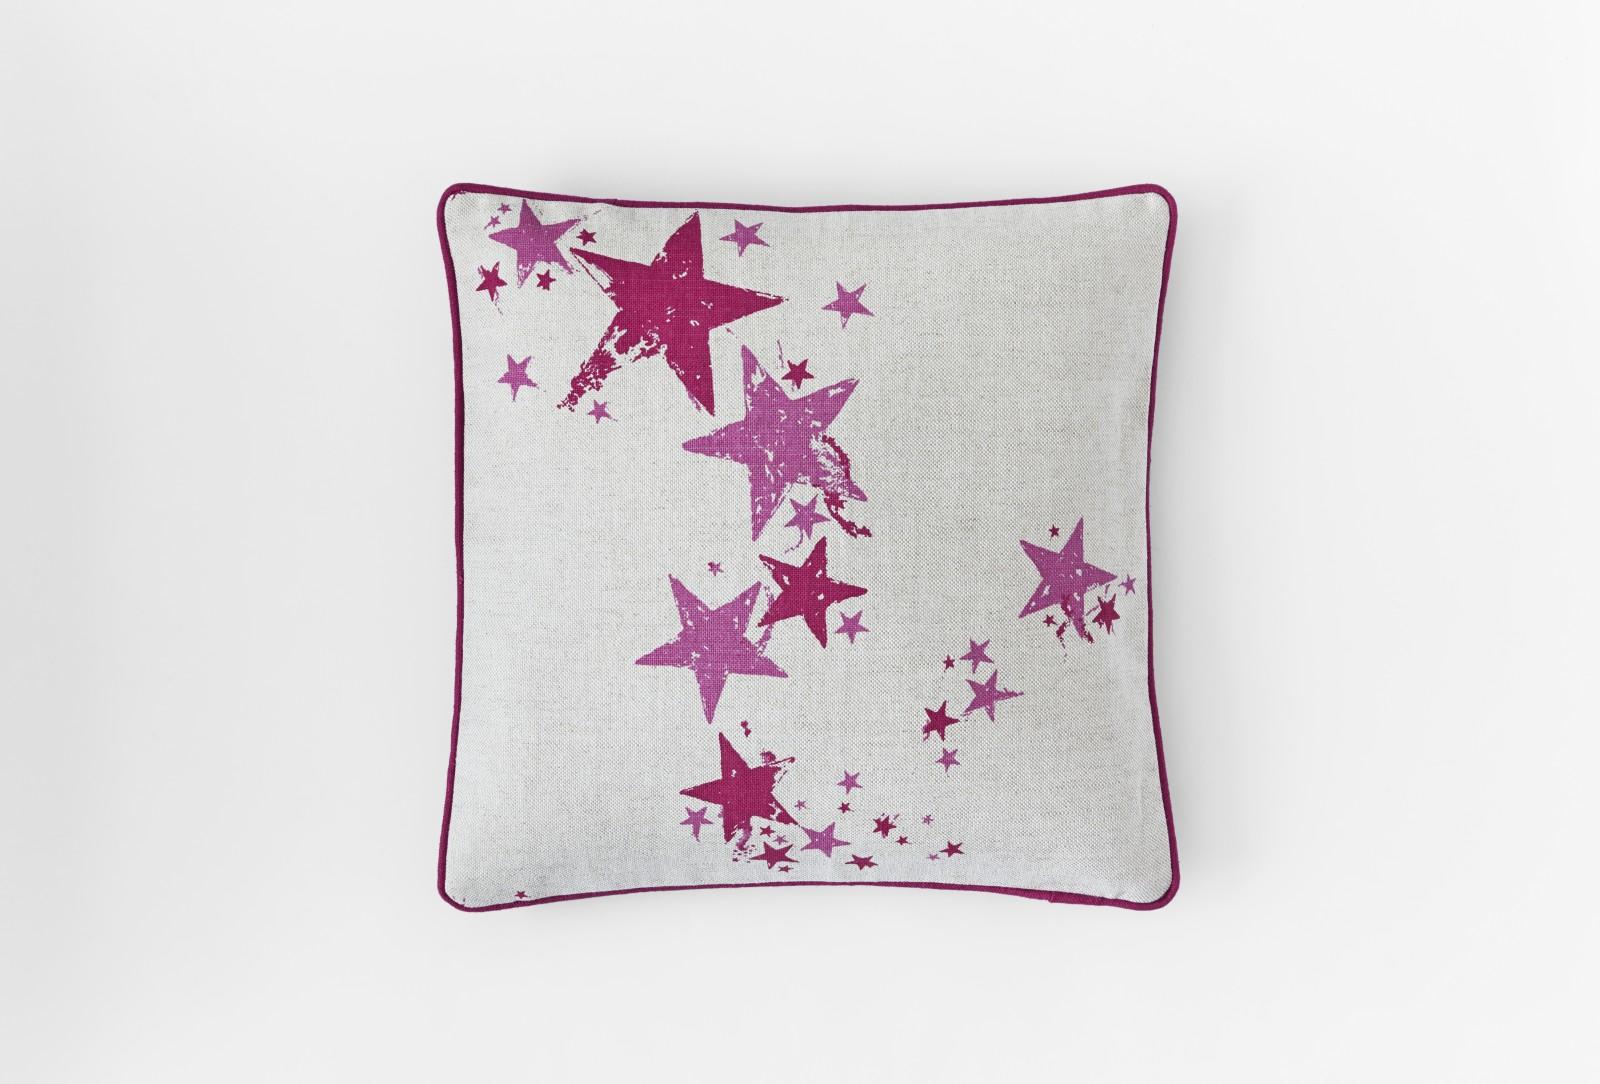 All Star Cushion Candy